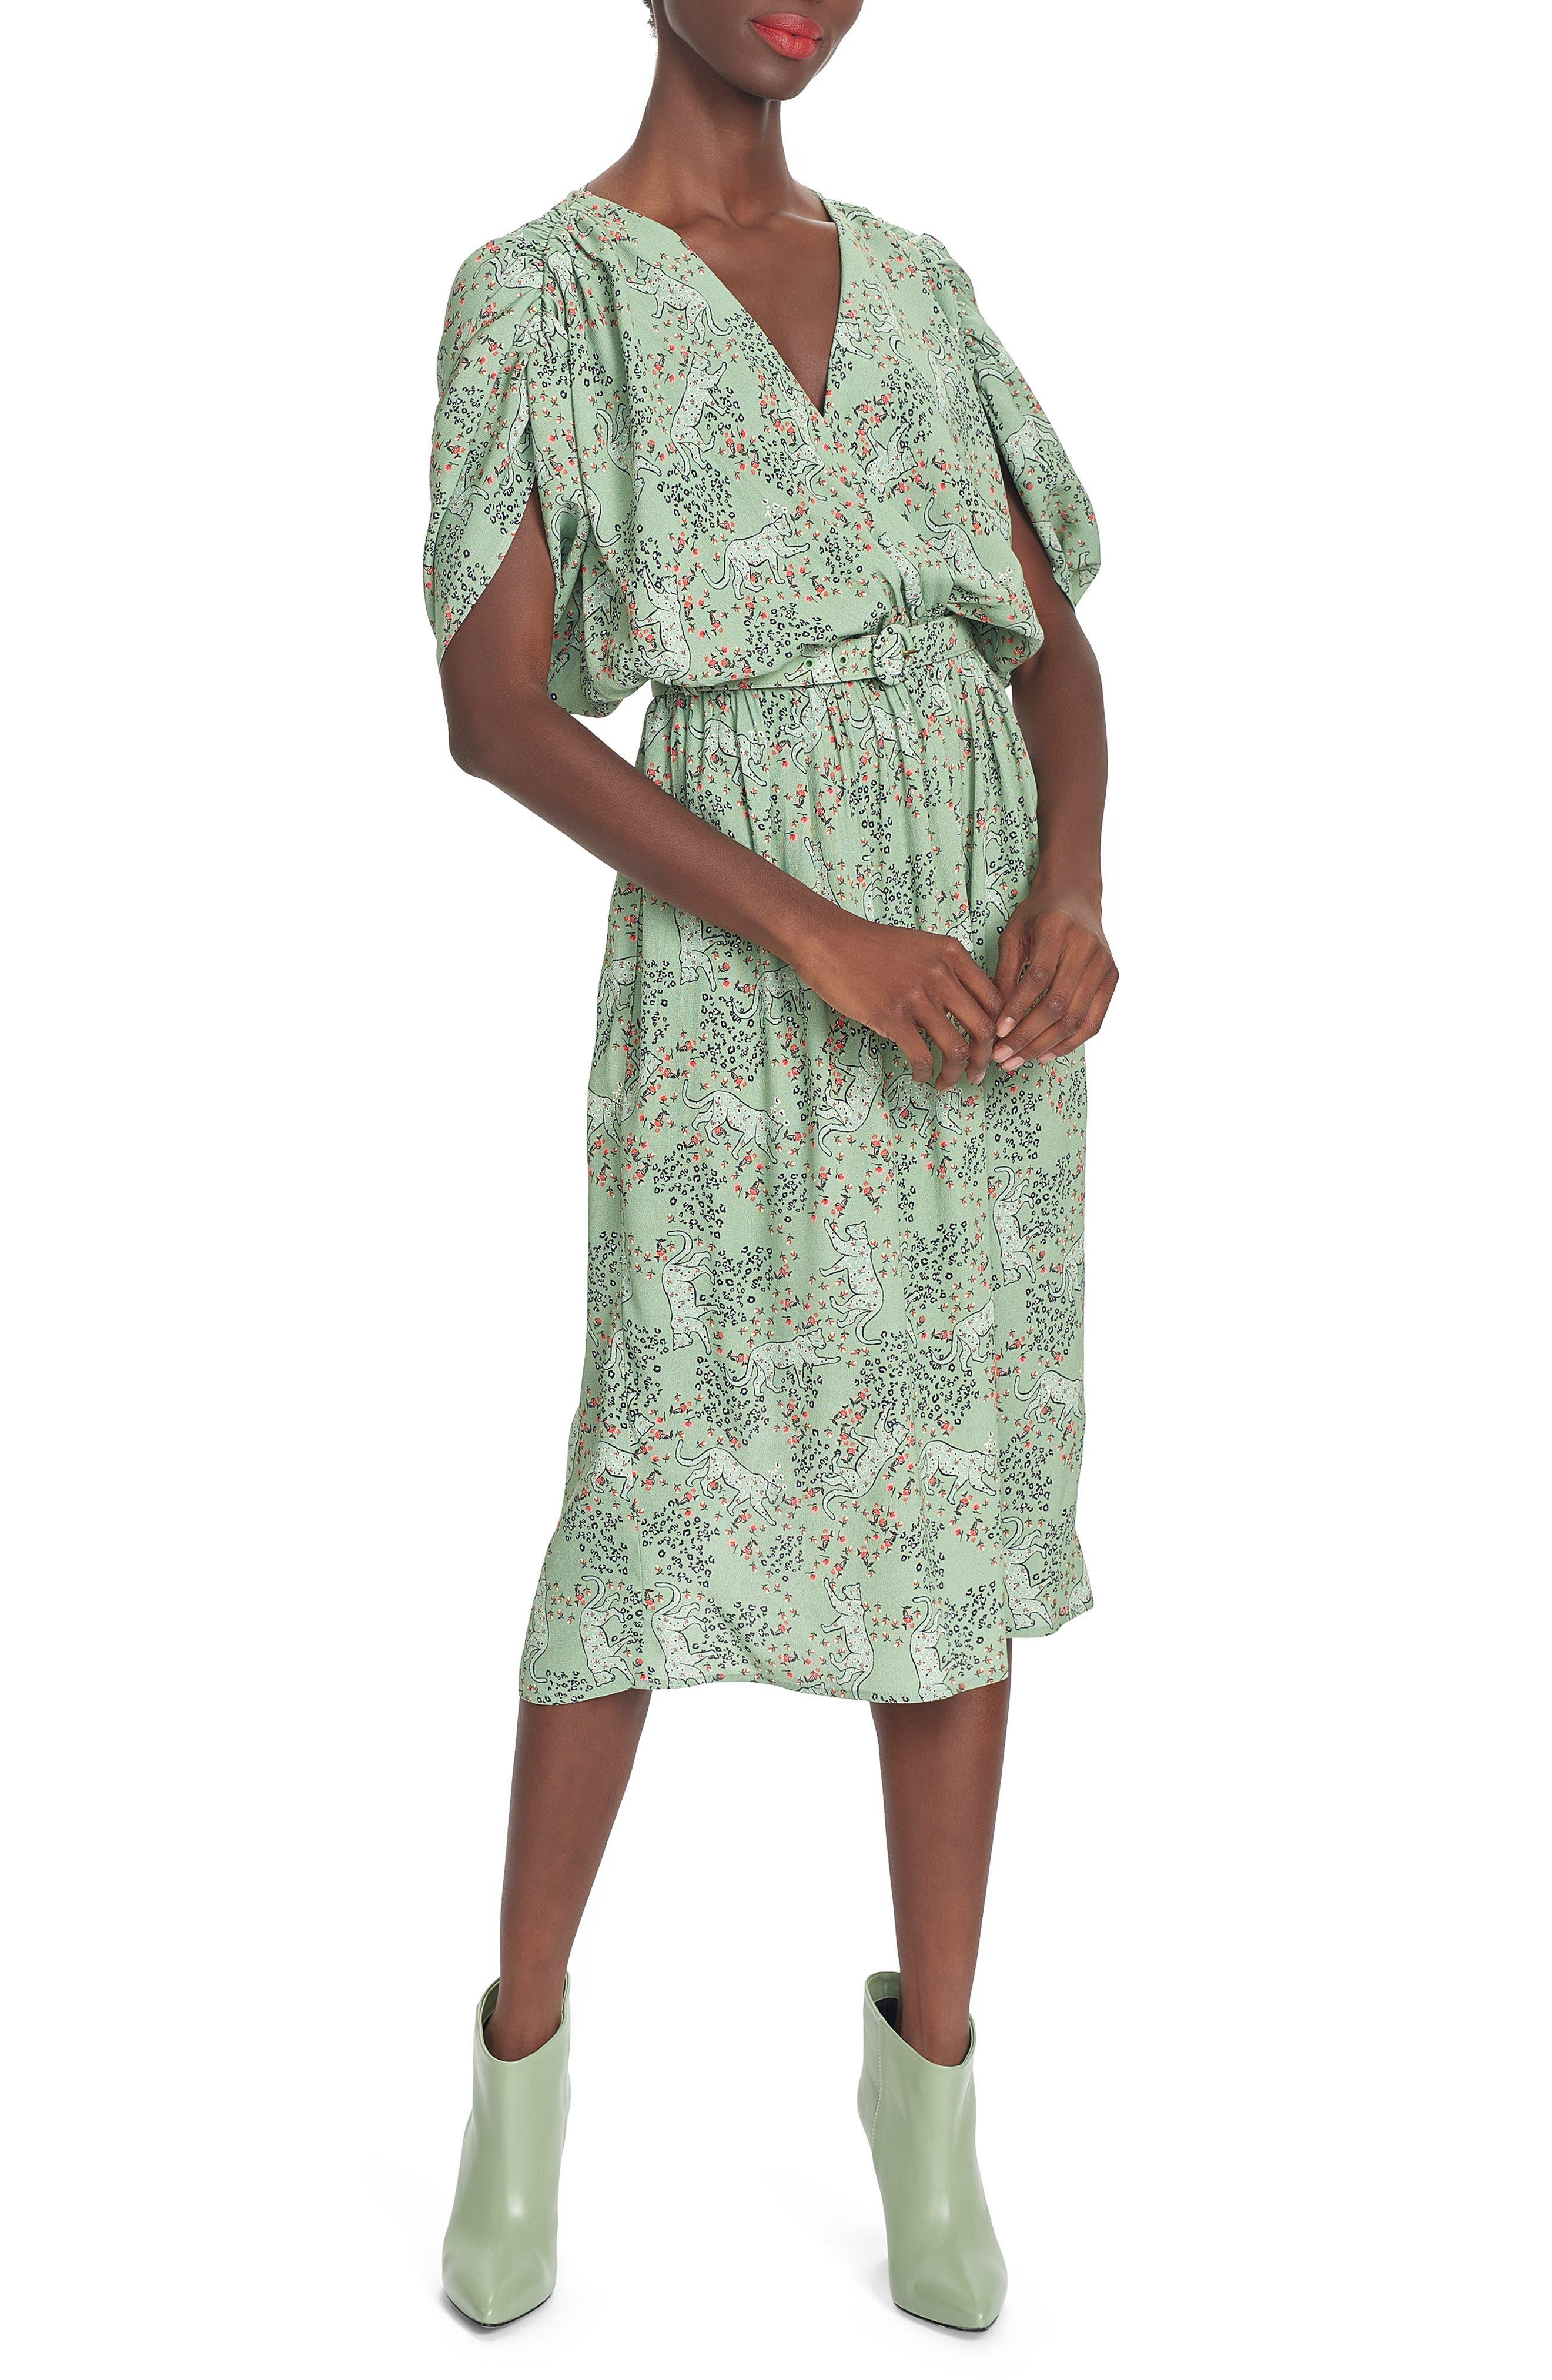 Corey Lynn Calter Lea Dress